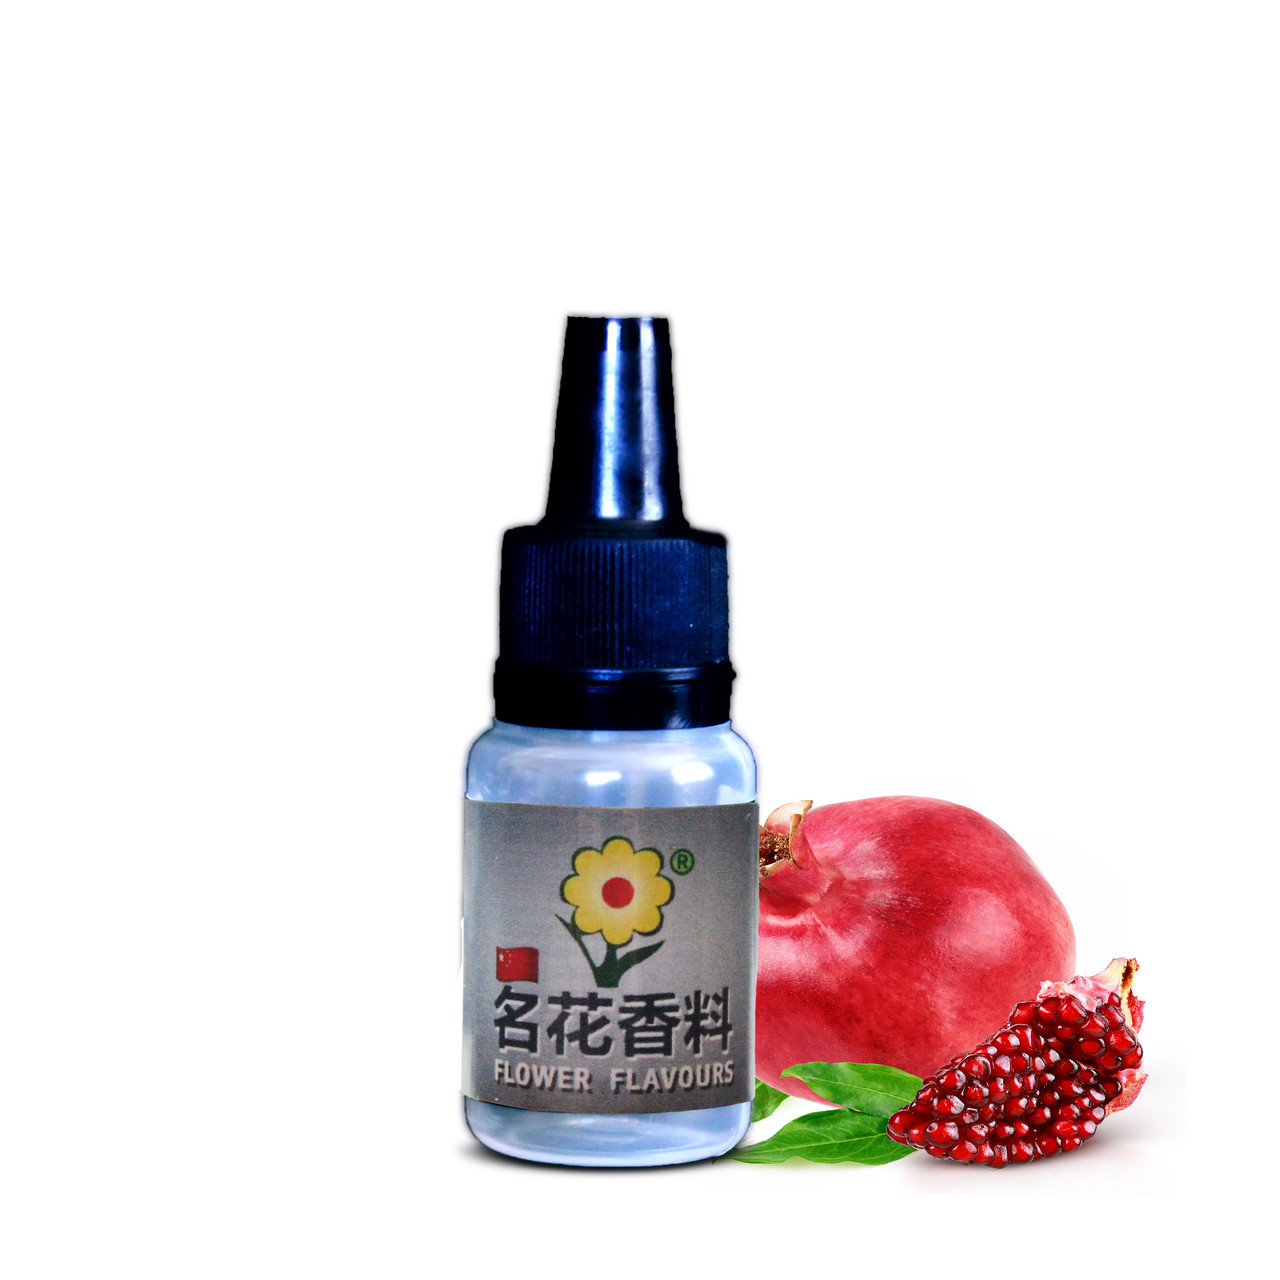 Ароматизатор  Flower Flavours Pomegranate ( Гранат ) 5 мл